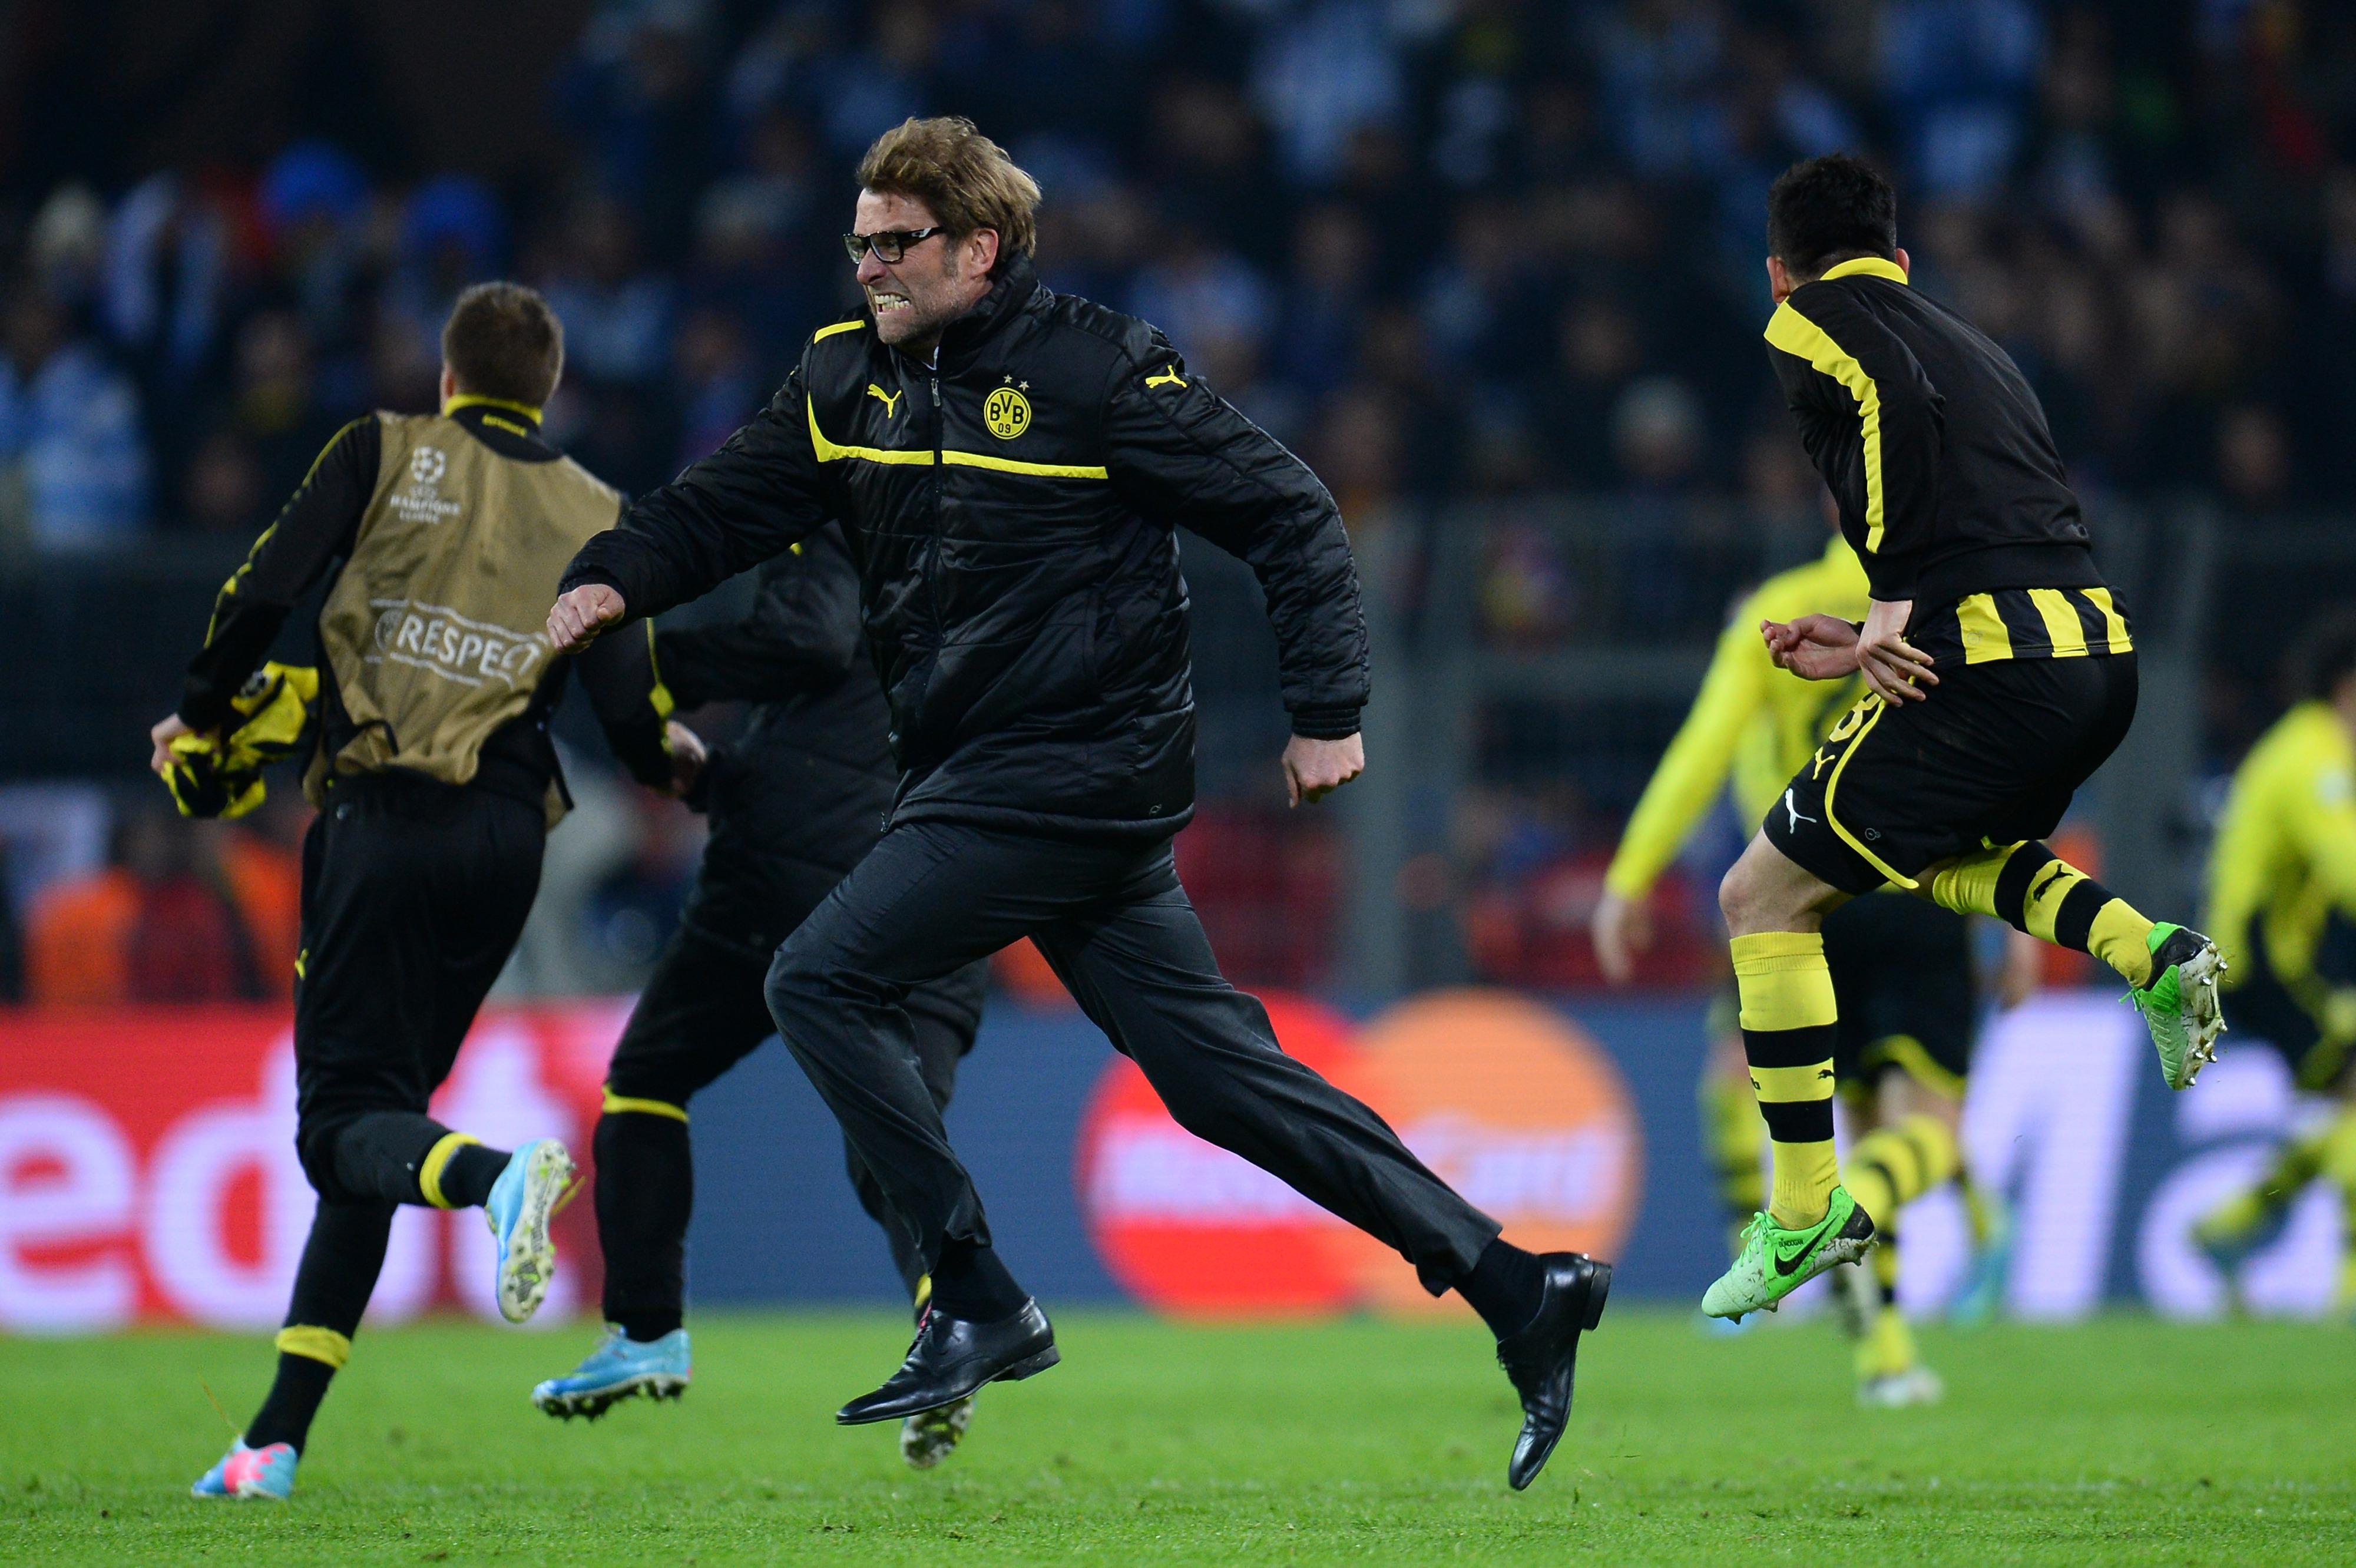 Borussia Dortmund vs. Real Madrid, 2013 UEFA Champions League: Preview